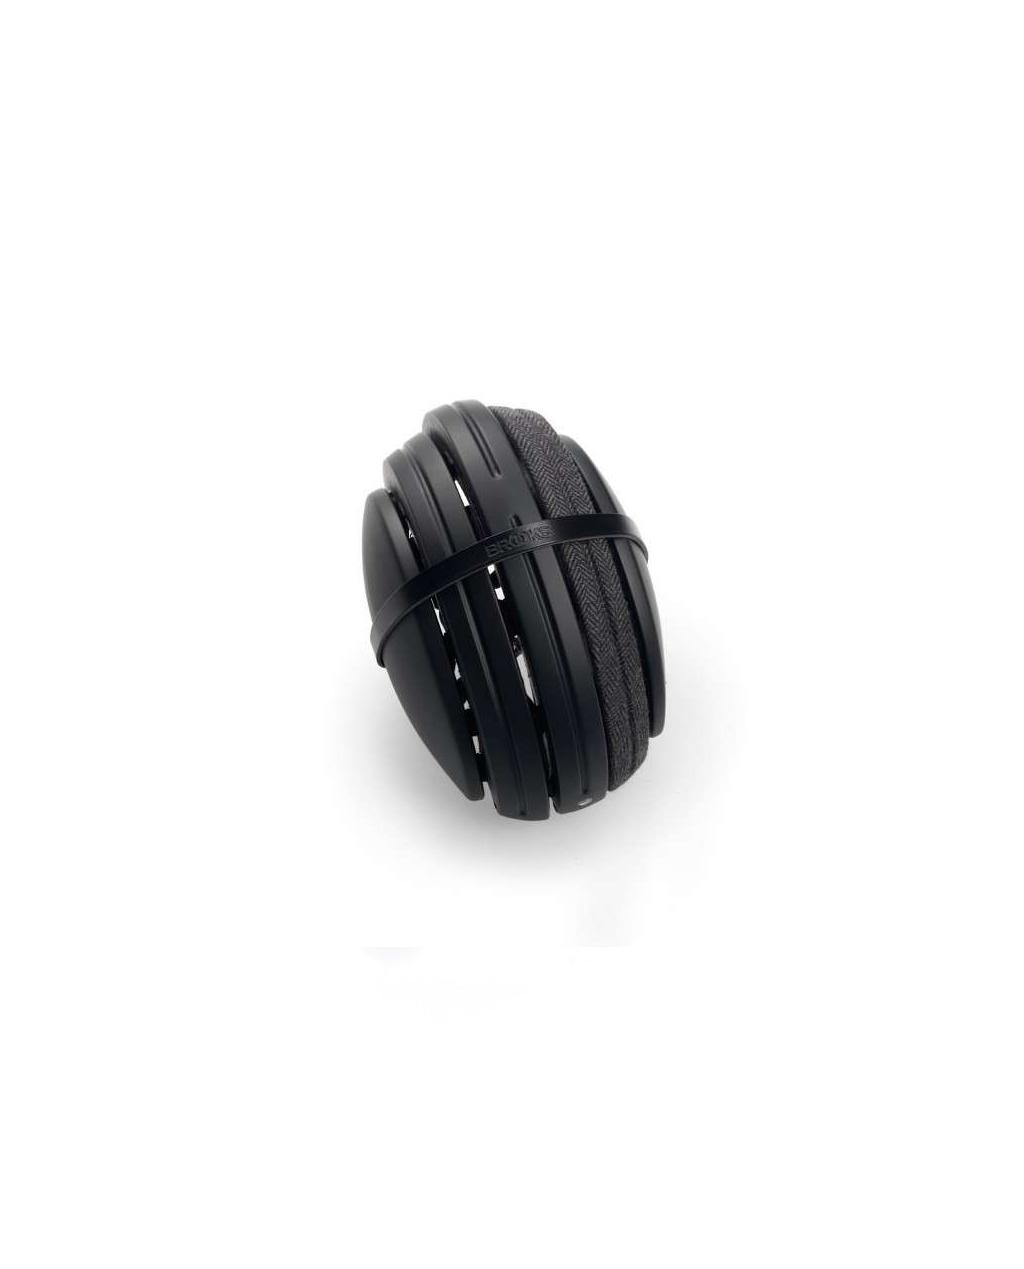 Brooks - Carrera Foldable Helmet - Black / Grey Herringbone